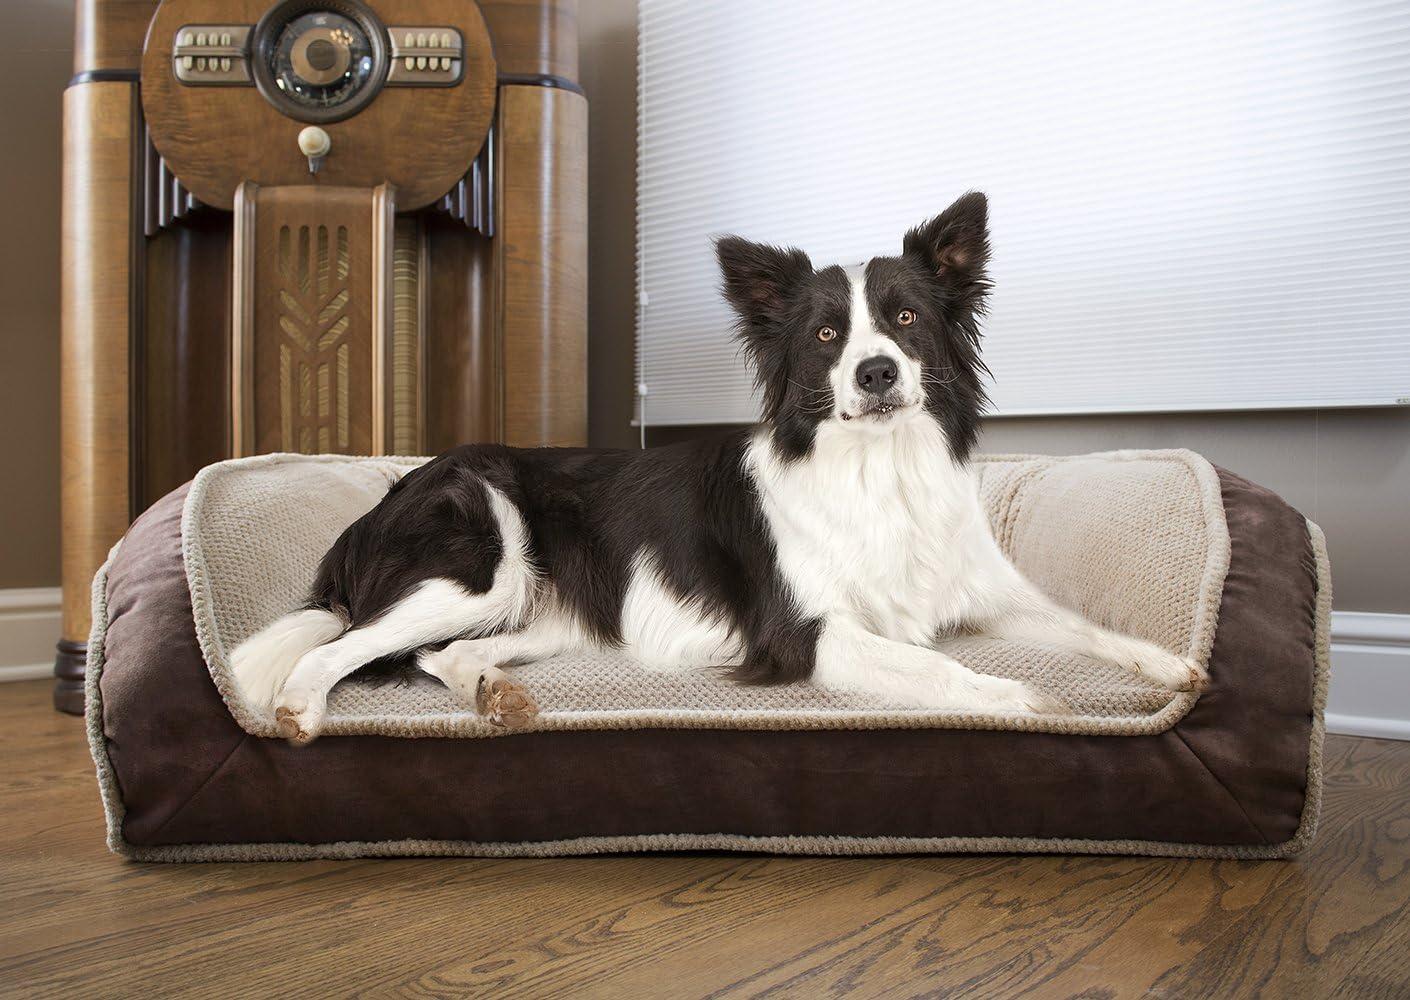 Arlee Deep Seated Lounger Sofa Pet Bed, Small/Medium, Chocolate Brown